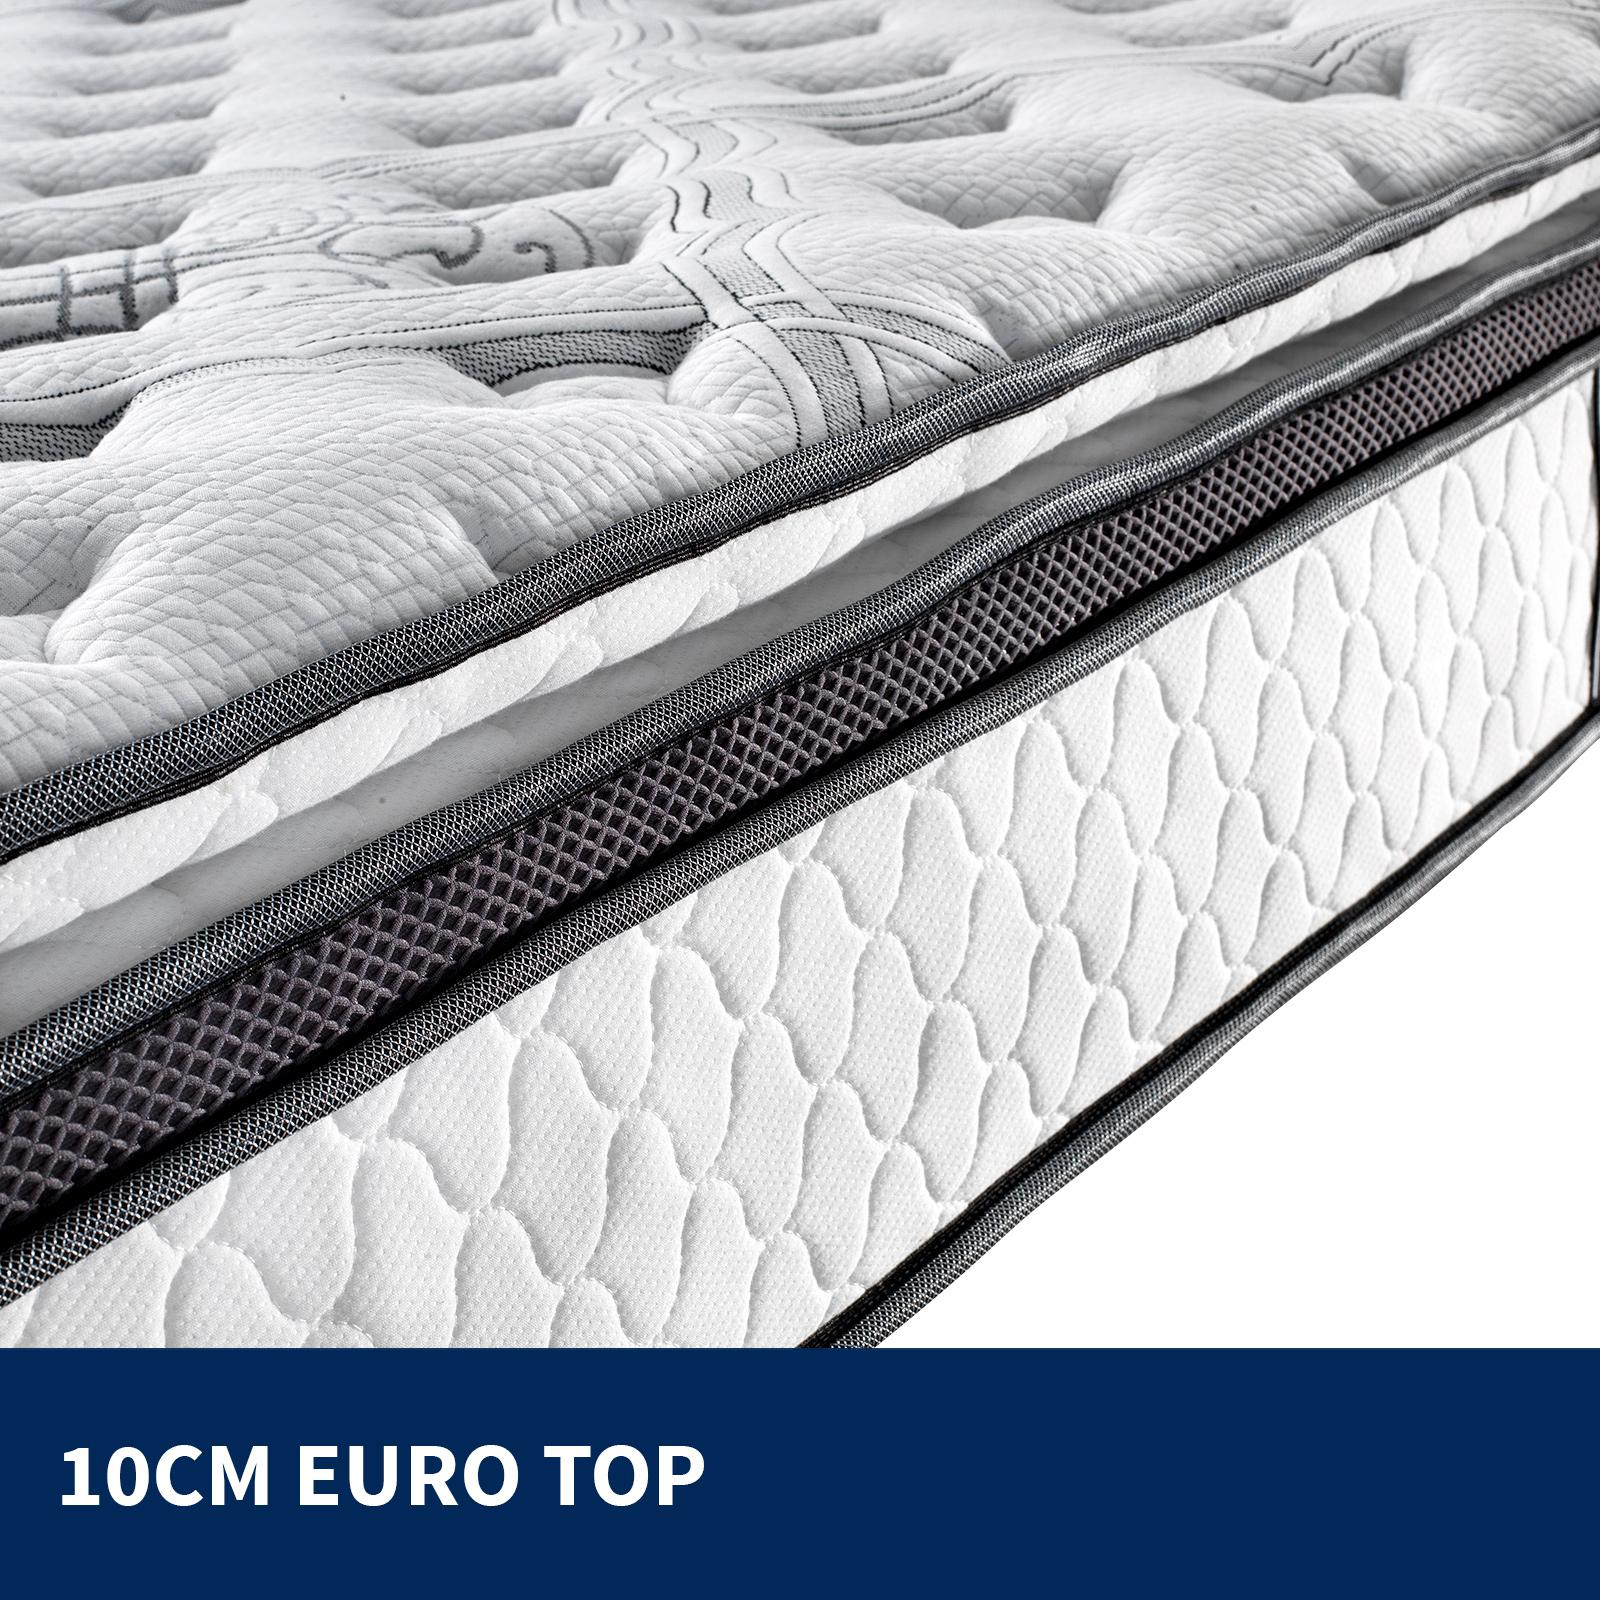 king single mattress euro and pillow top 9 zone pocket latex memory foam 34cm